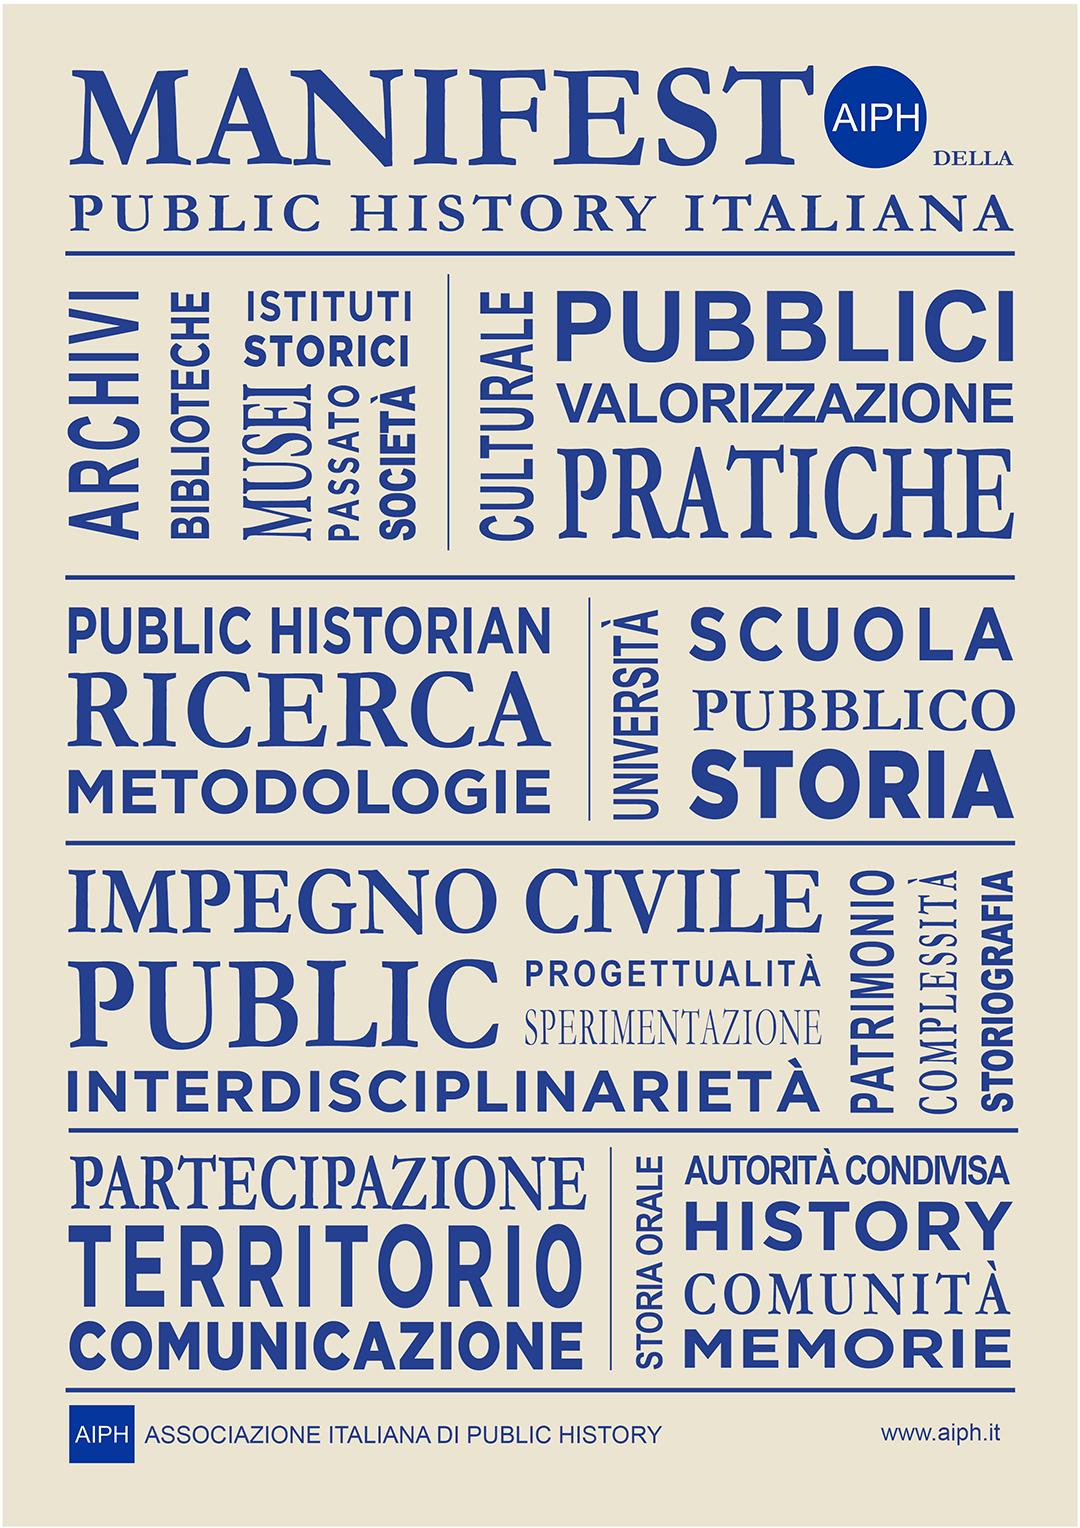 Manifesto PH Italiana